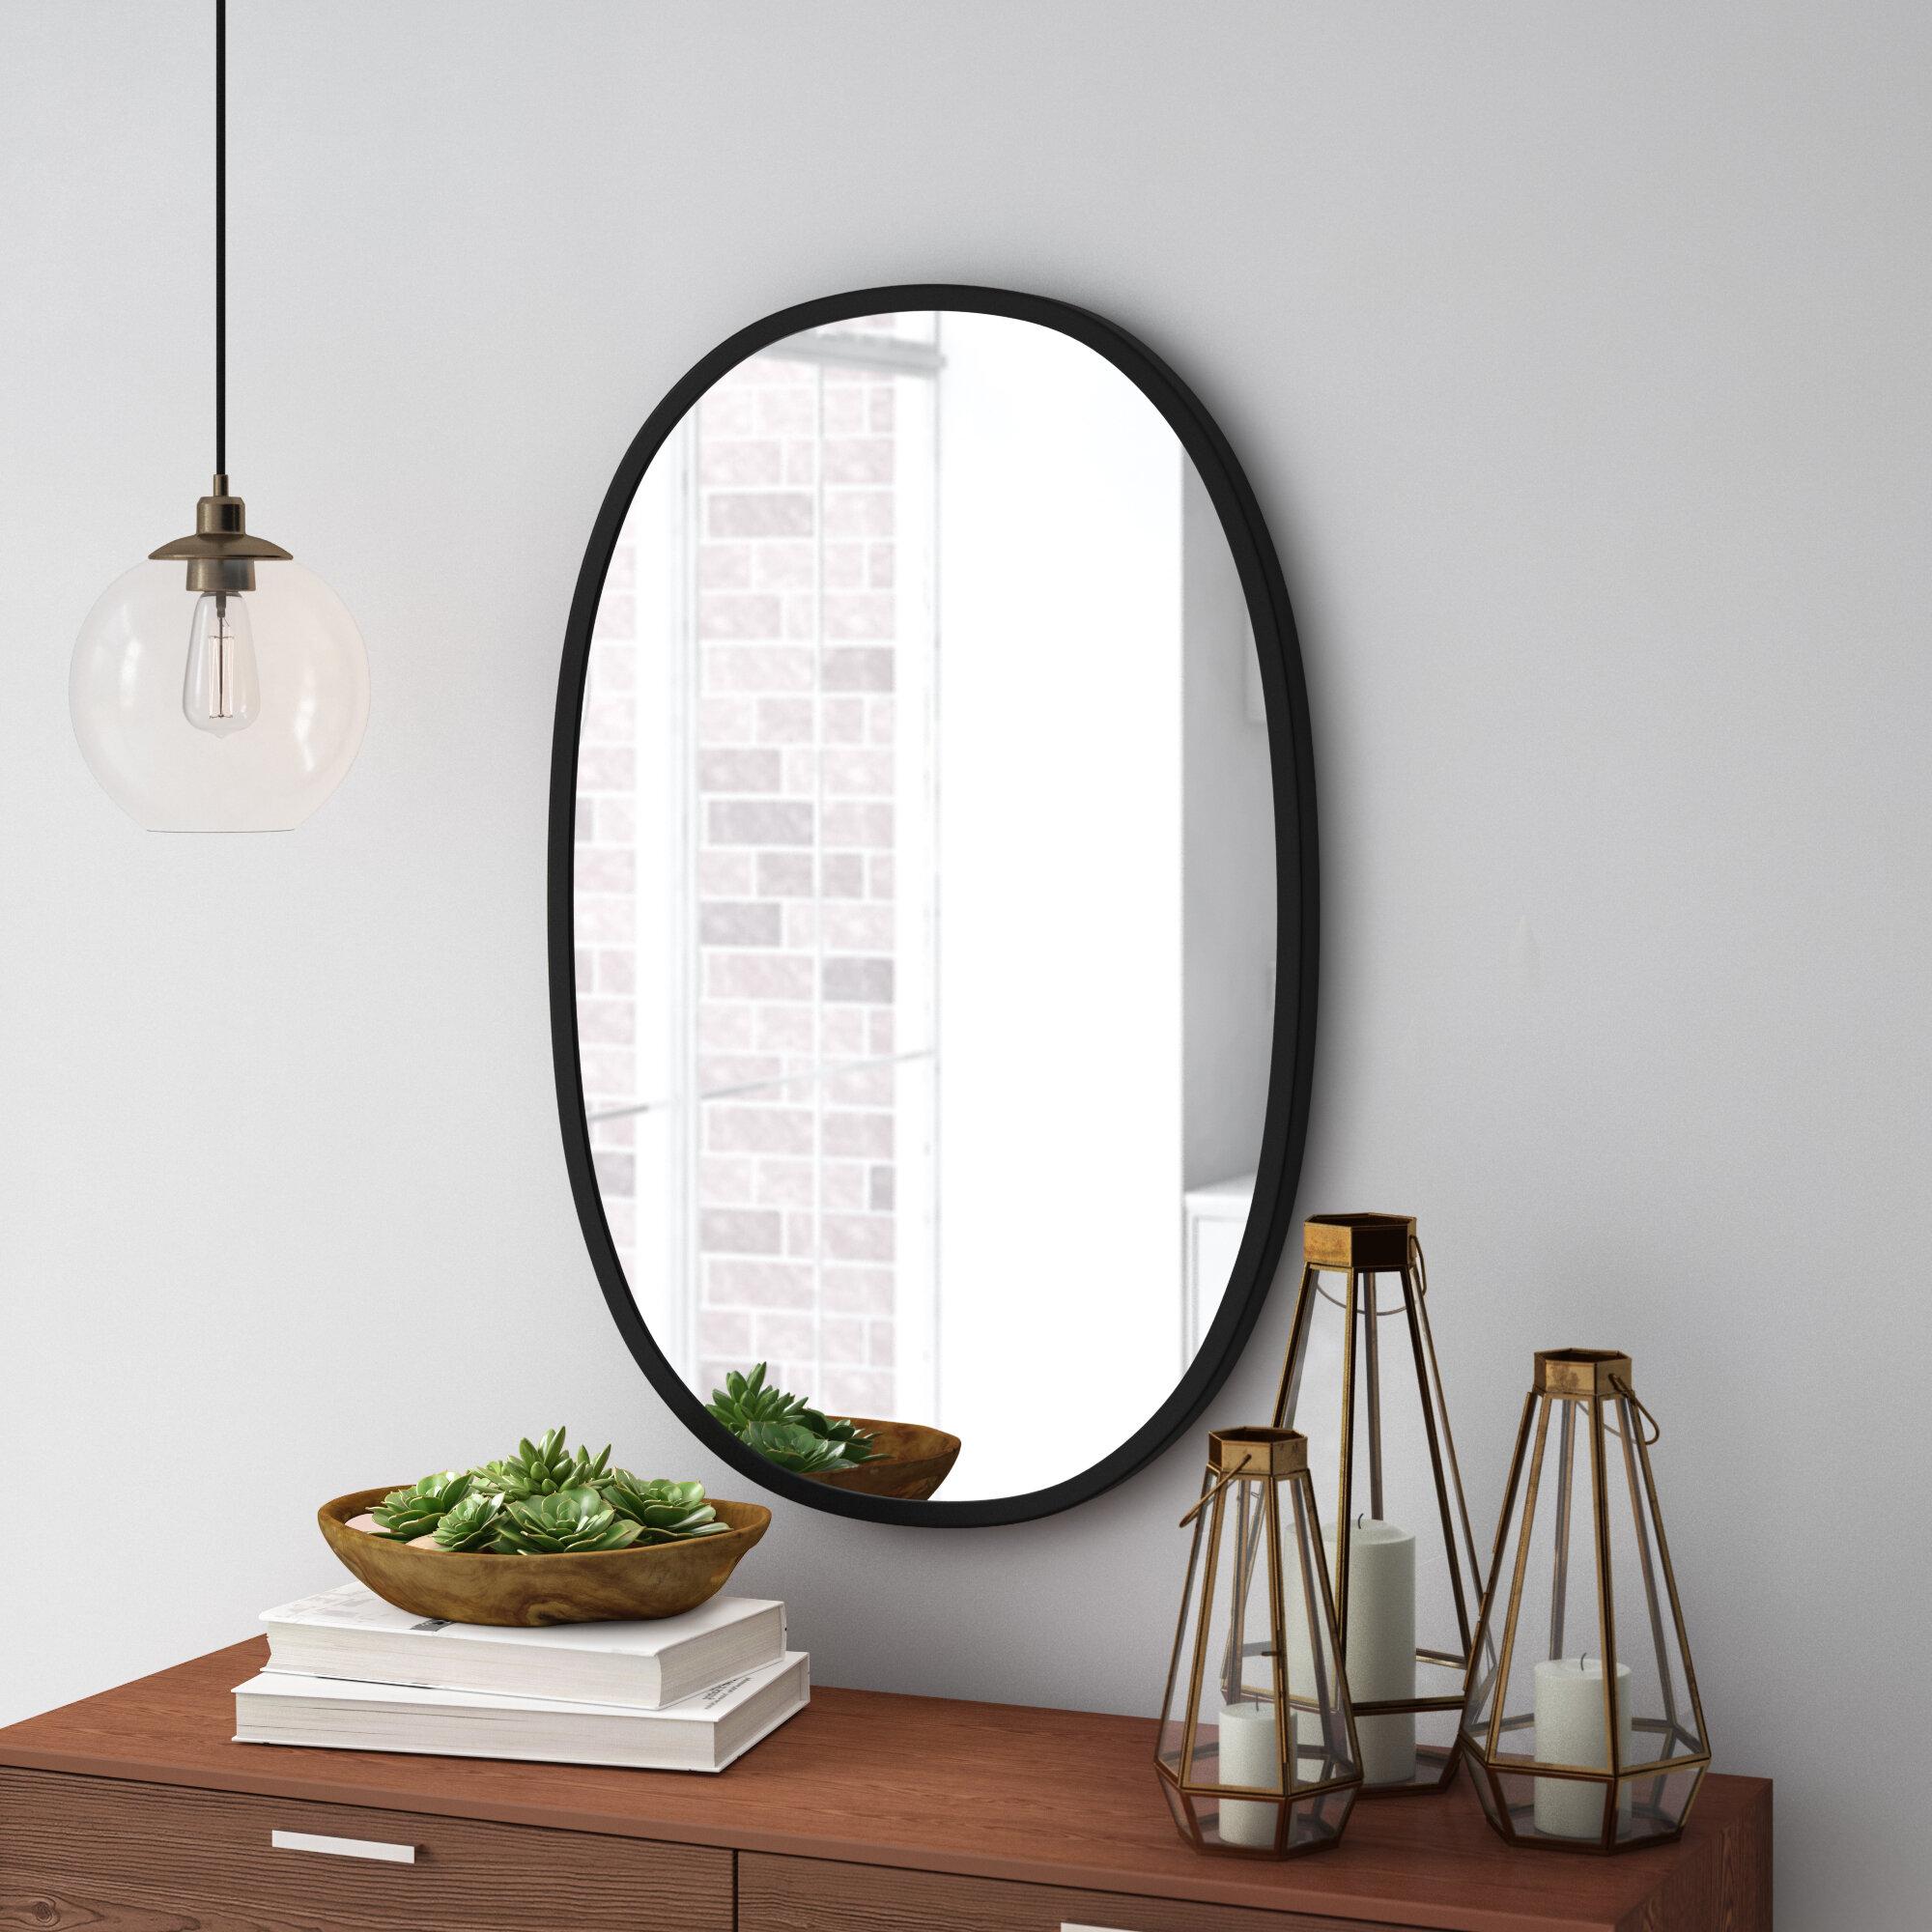 Umbra Hub Accent Mirror Reviews Wayfair